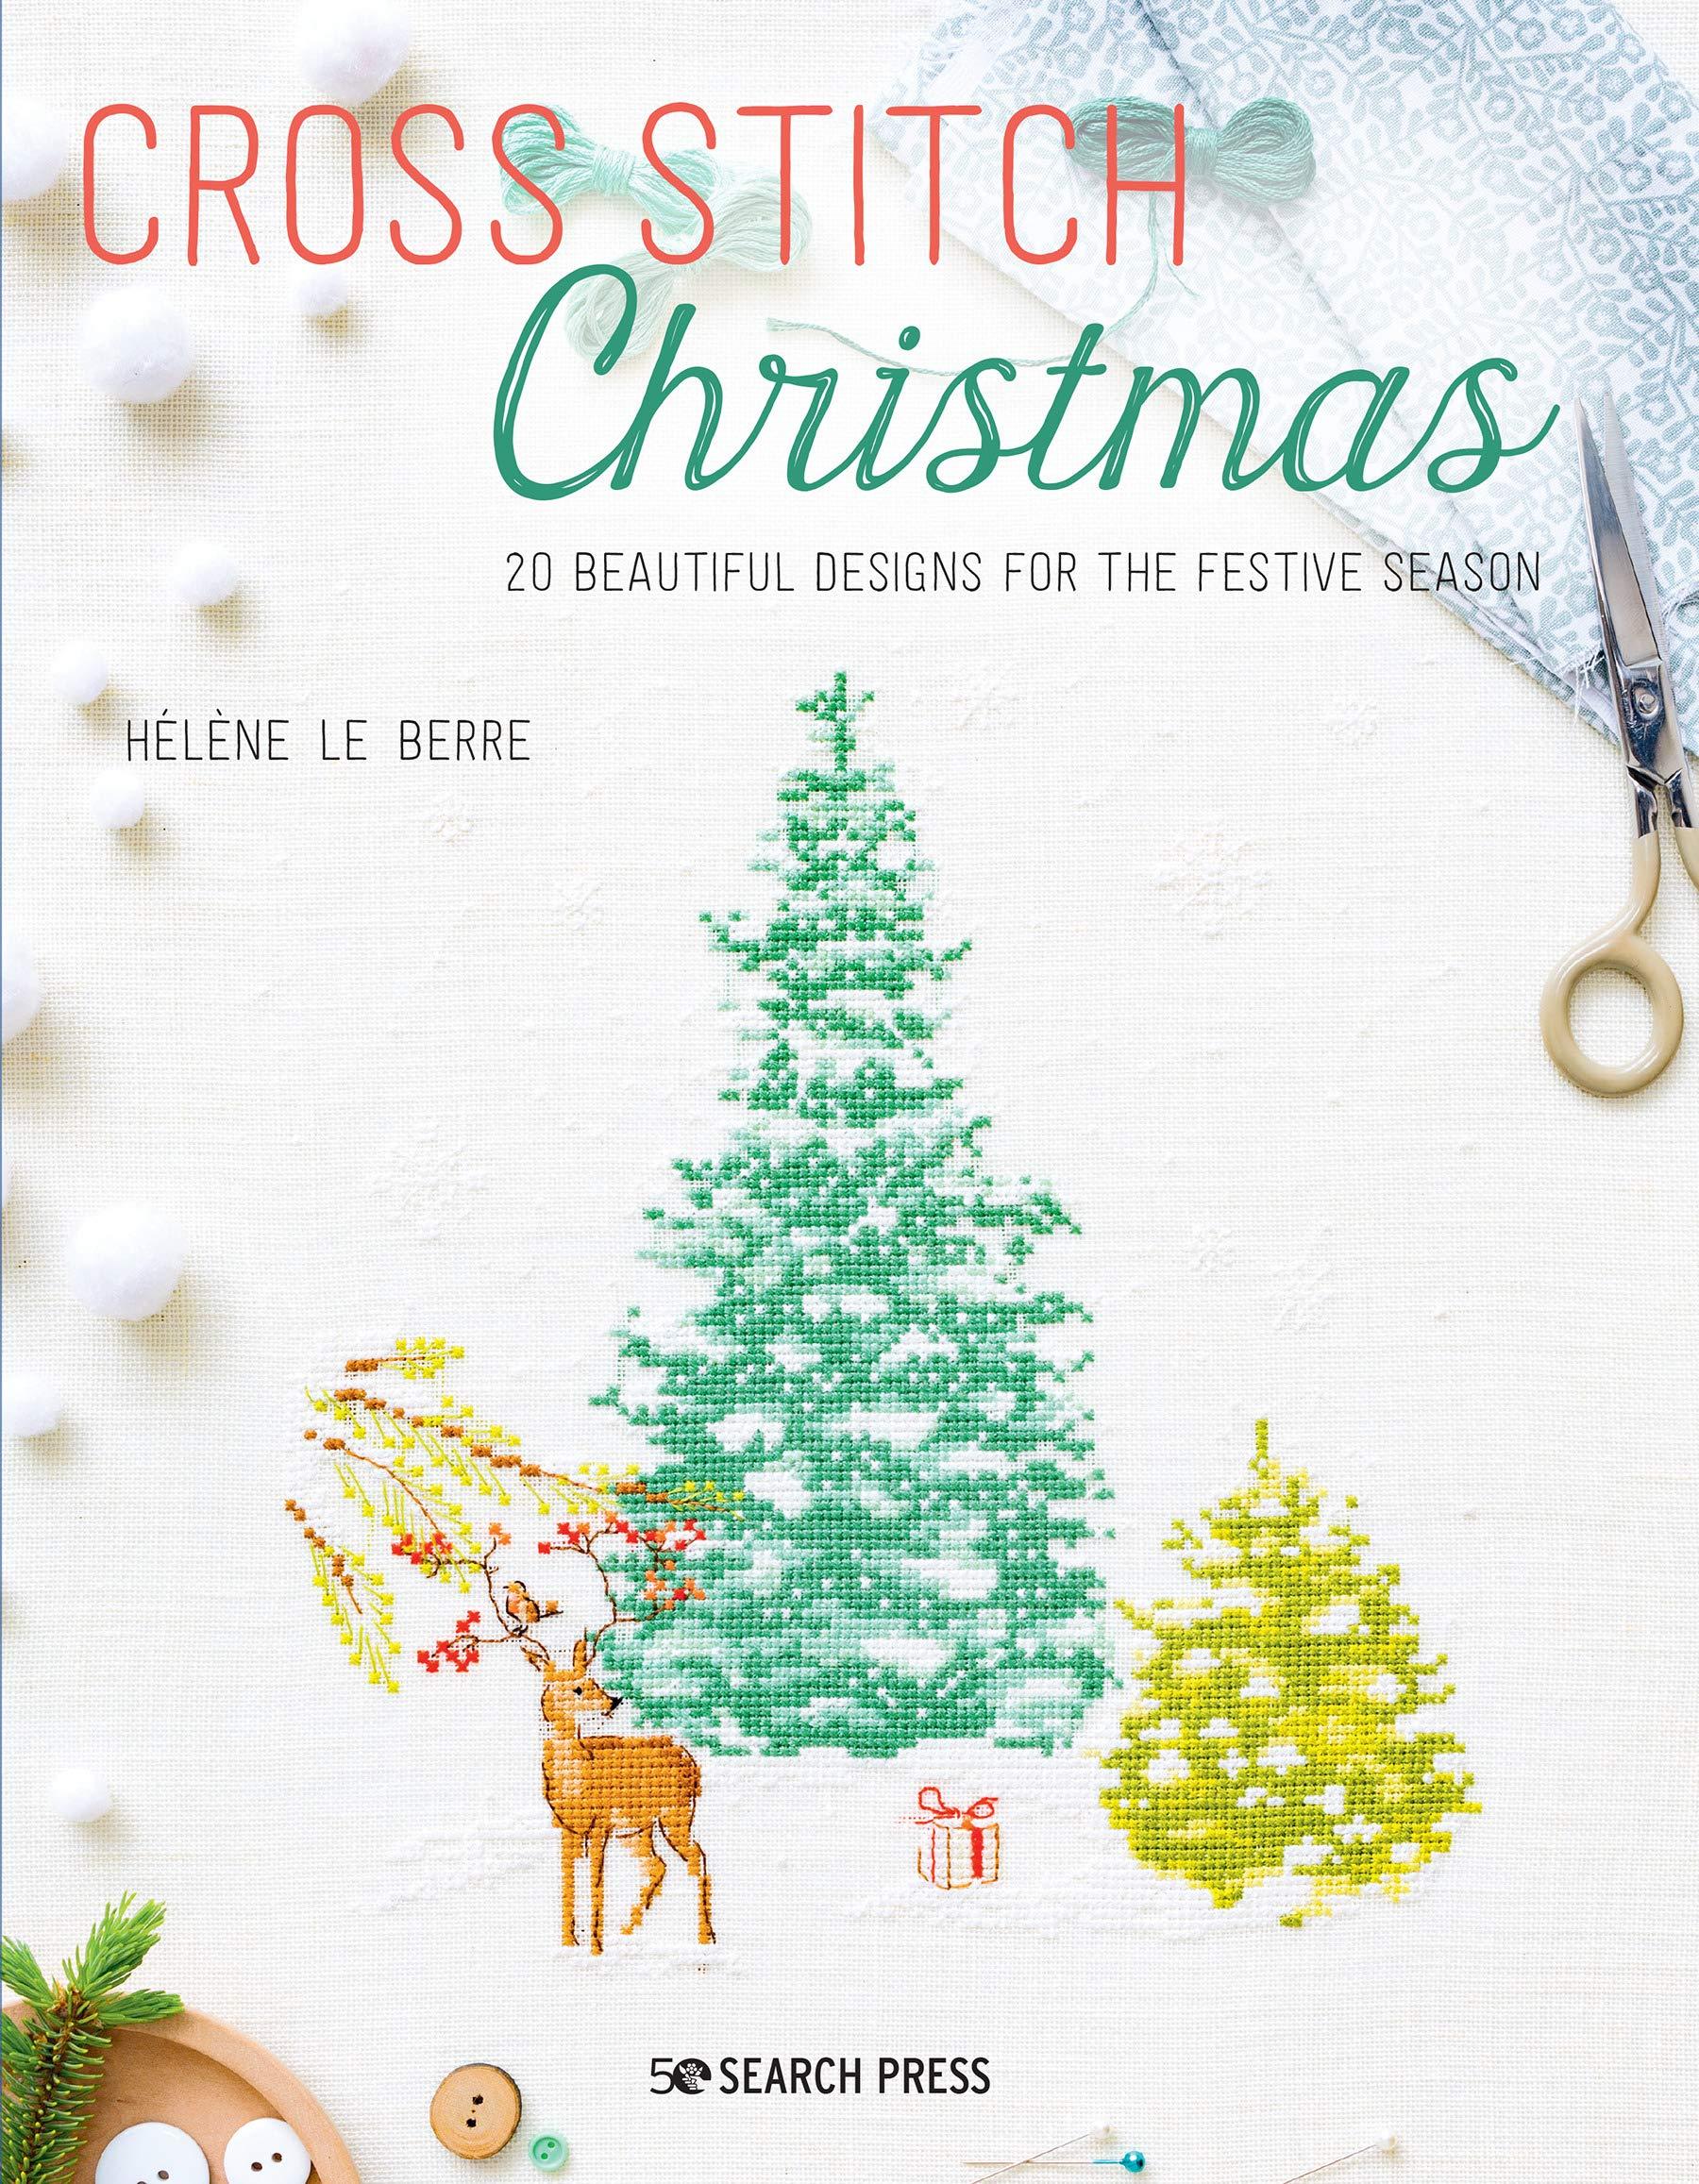 A Cross Stitch Christmas Book 2020 Cross Stitch Christmas: 20 beautiful designs for the festive